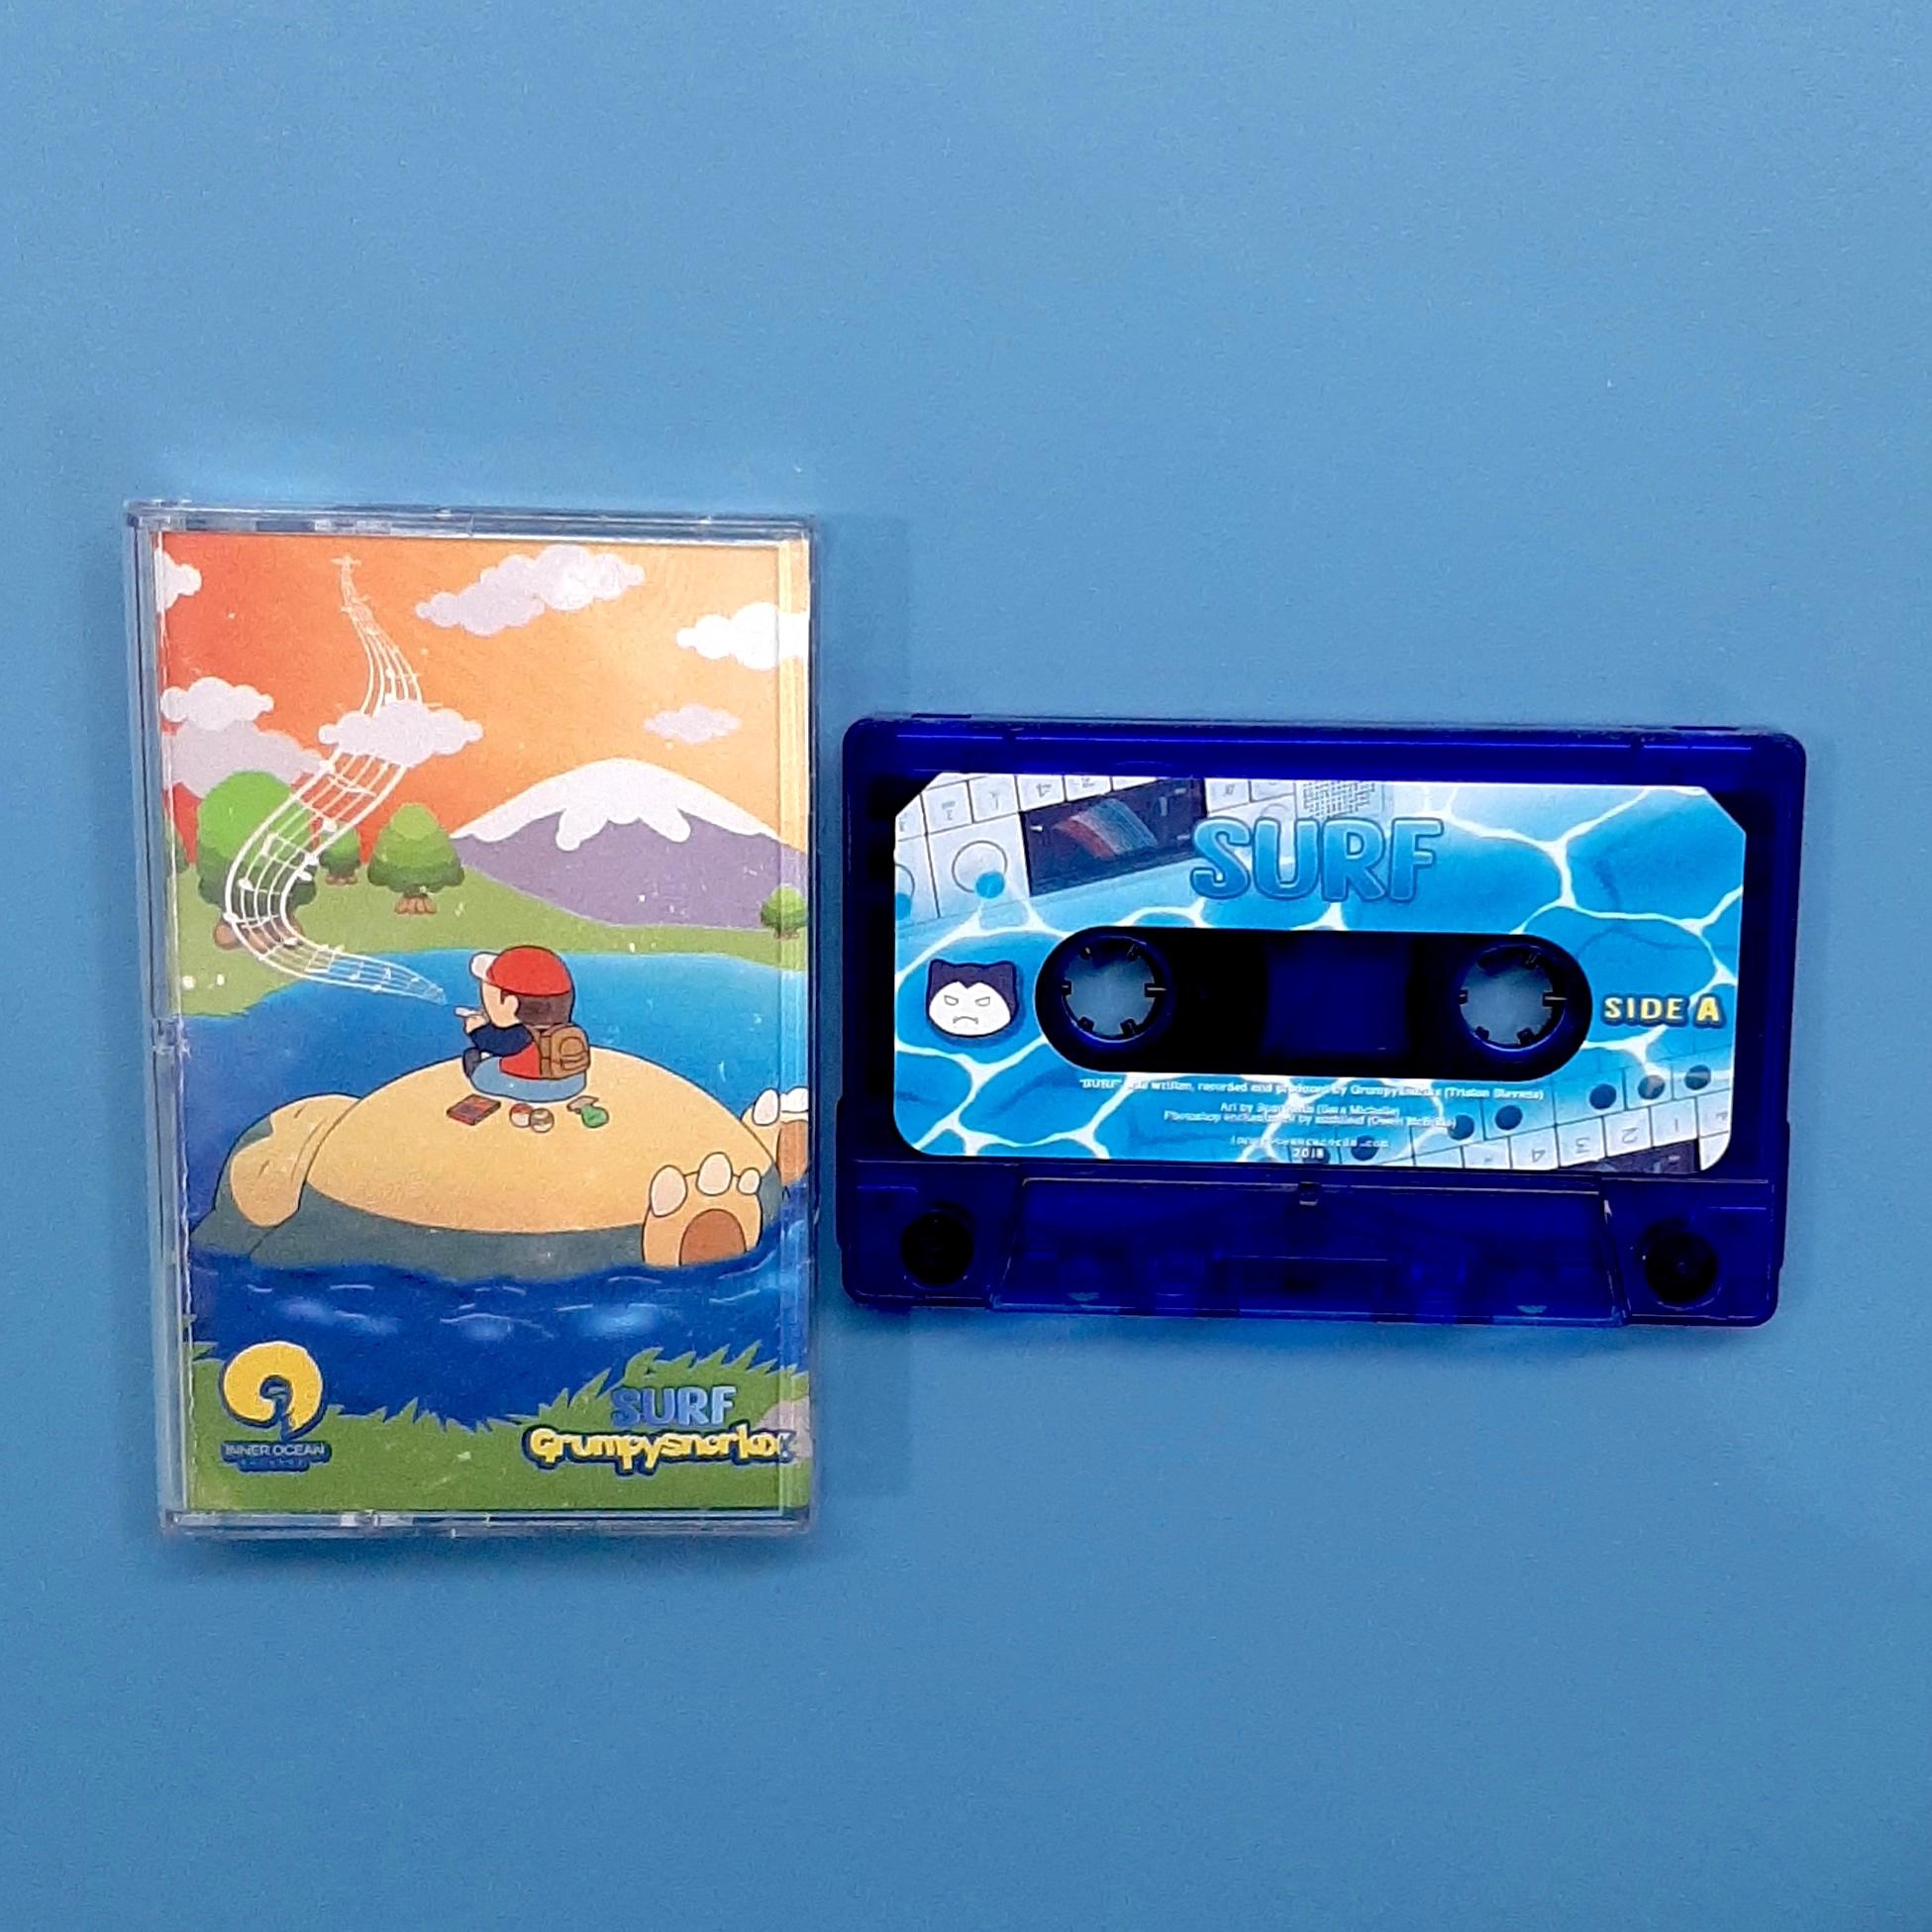 grumpysnorlax - Surf (Inner Ocean Records)